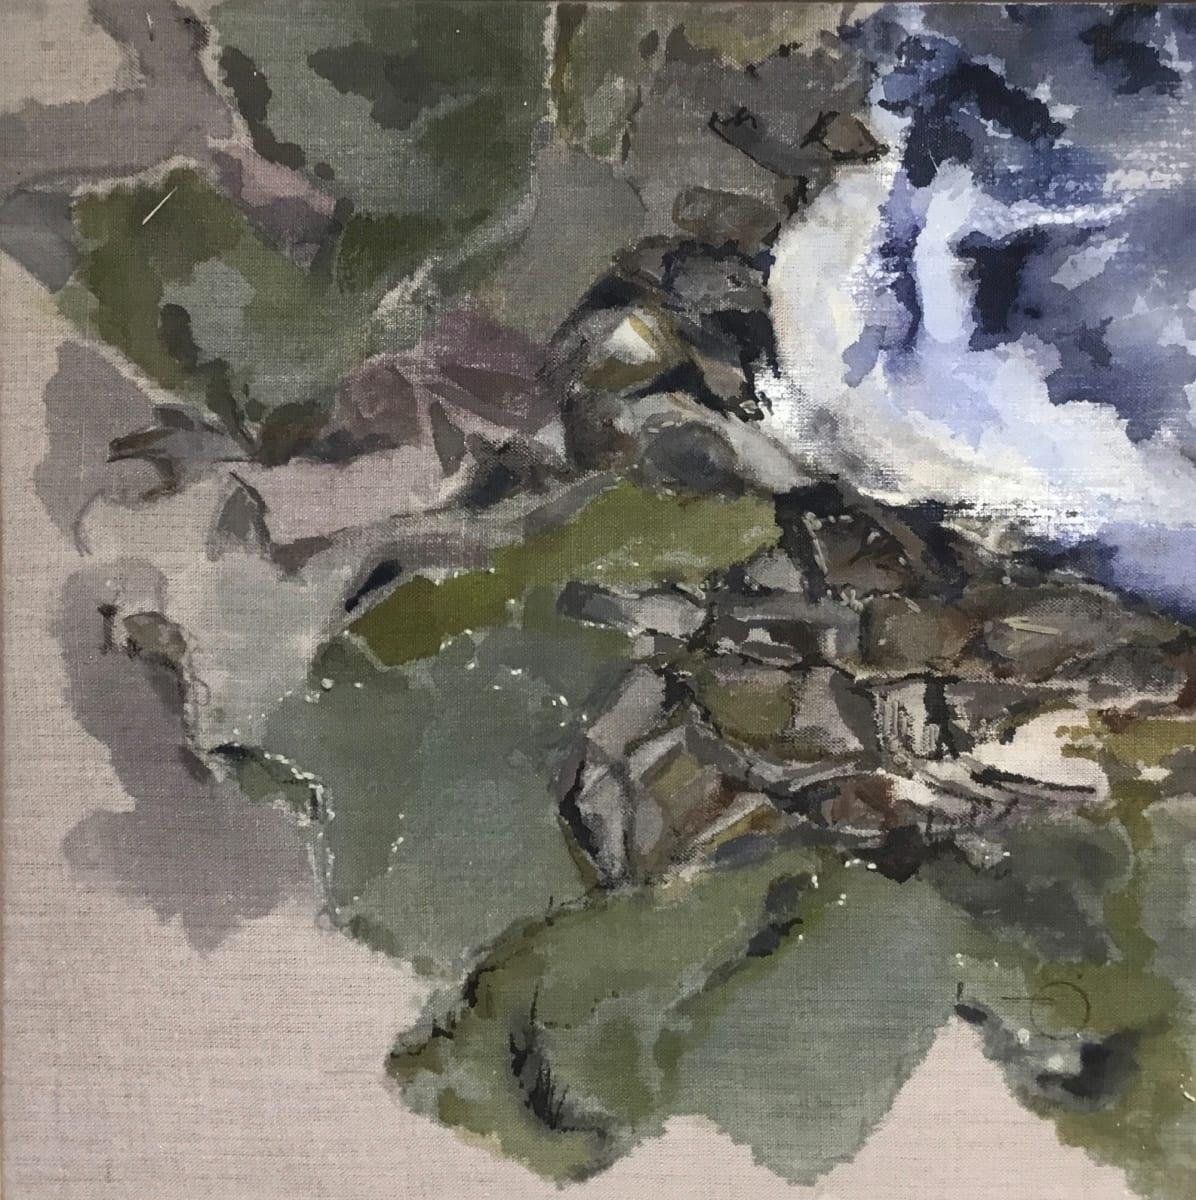 Water's Edge 4 E (Verso) by Barbara Houston